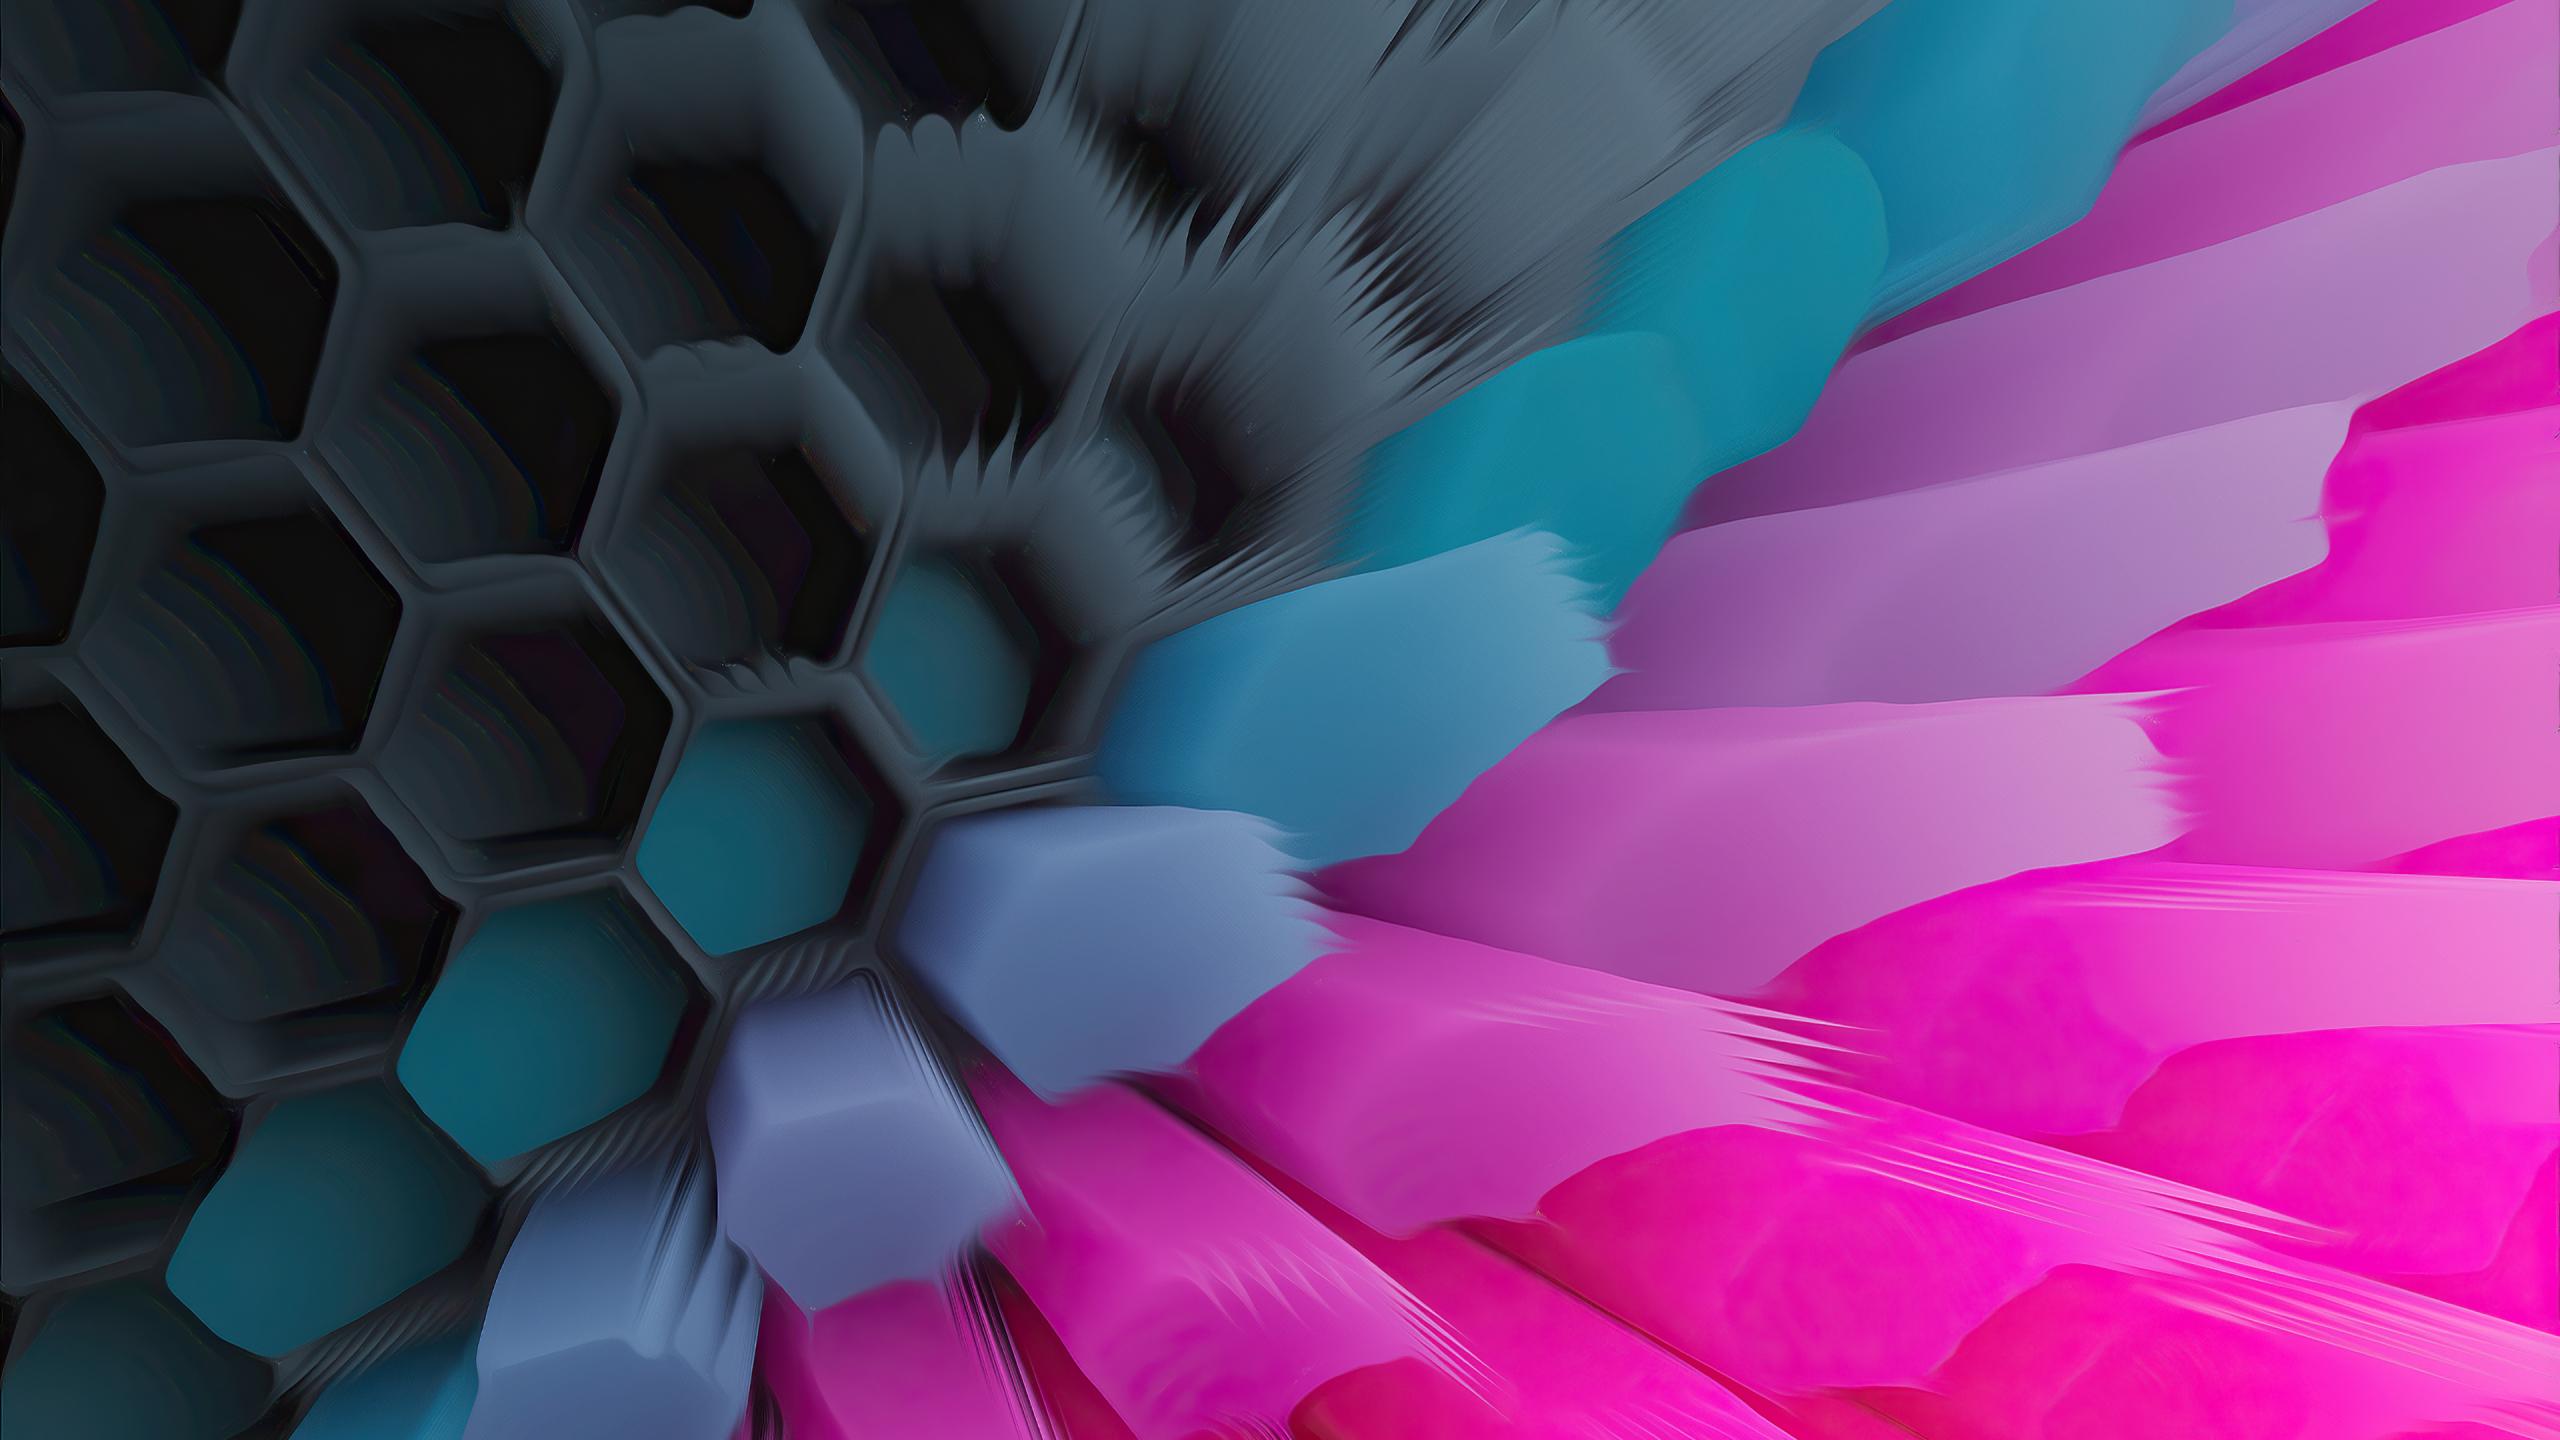 Pink Blue 4K Hexagon Wallpaper in 2560x1440 Resolution